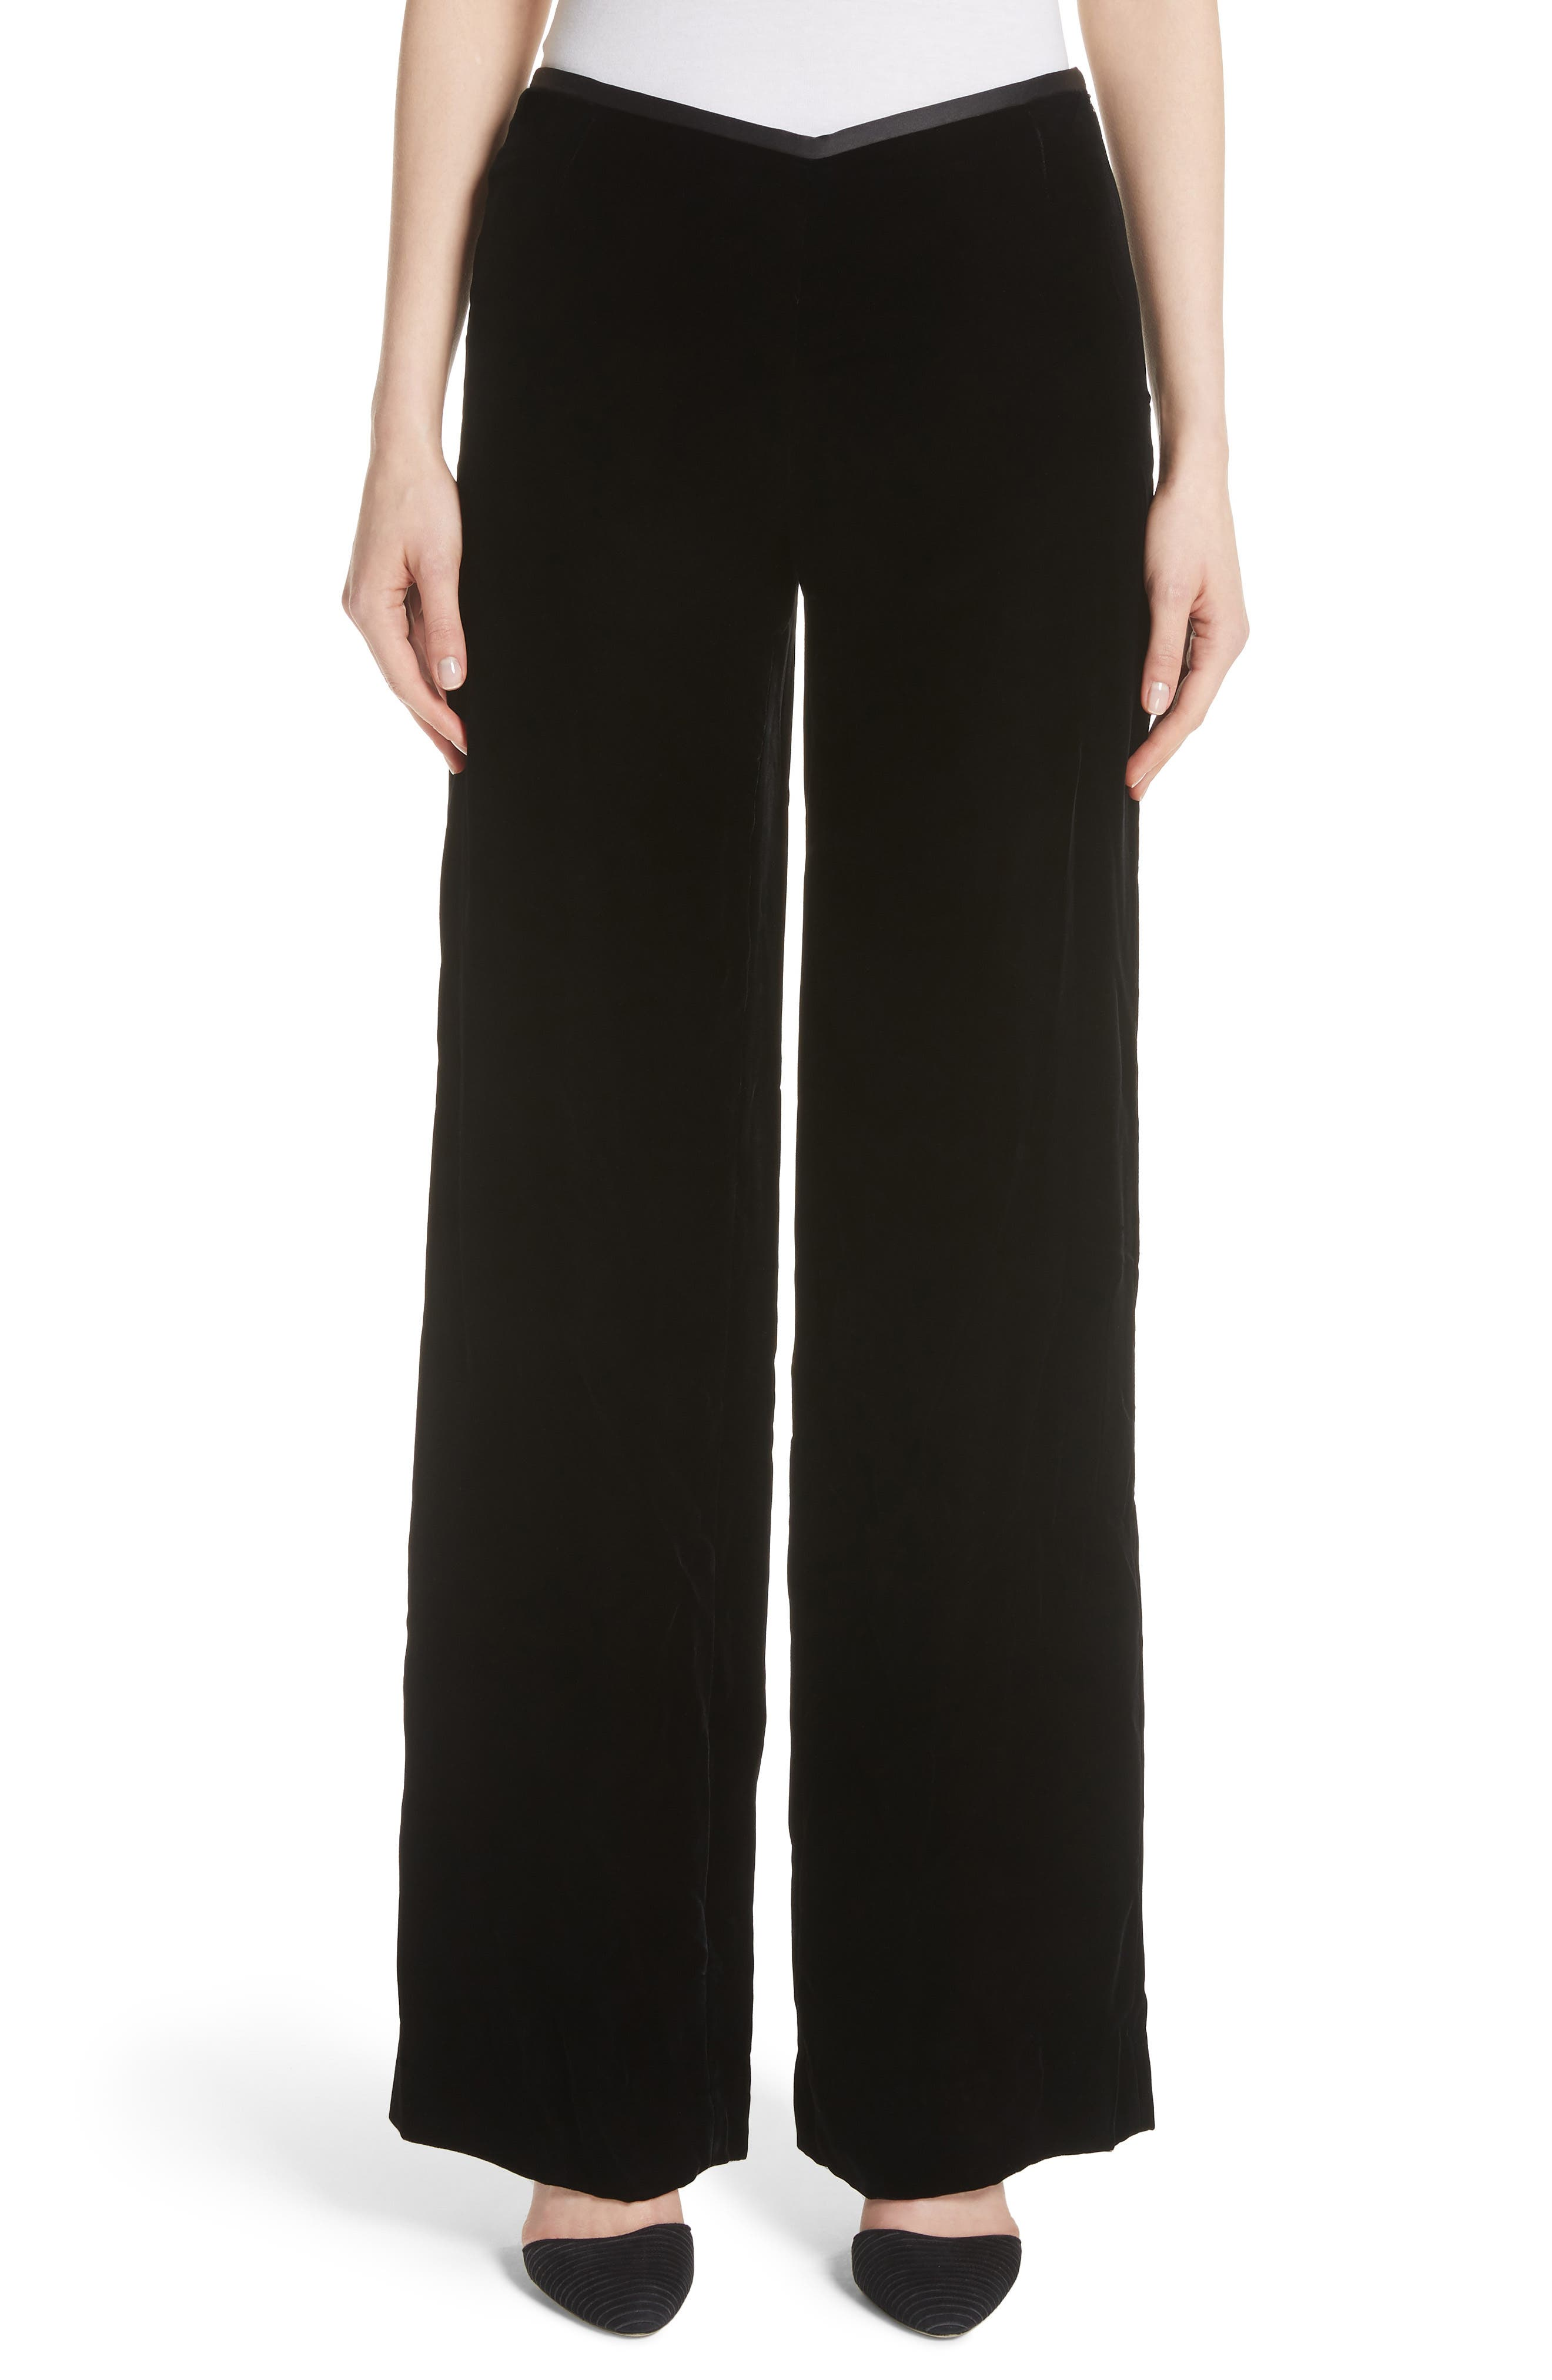 EMPORIO ARMANI, Wide Leg Velvet Pants, Main thumbnail 1, color, 004